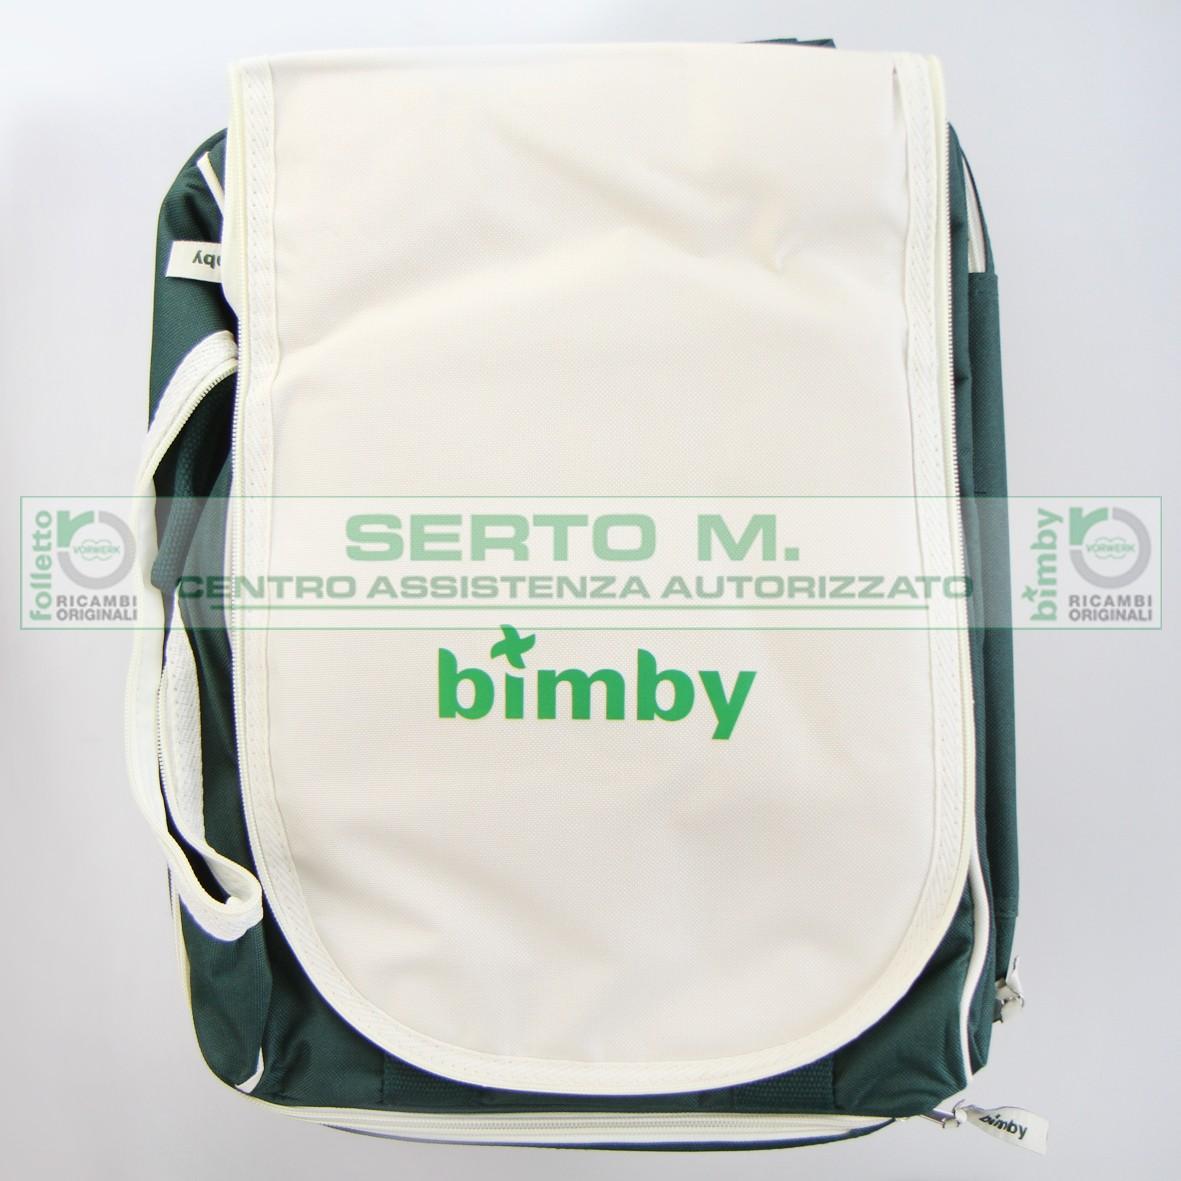 Bimby Caltanissetta Folletto Tm31 Assistenza Borsa GpMVUqSz